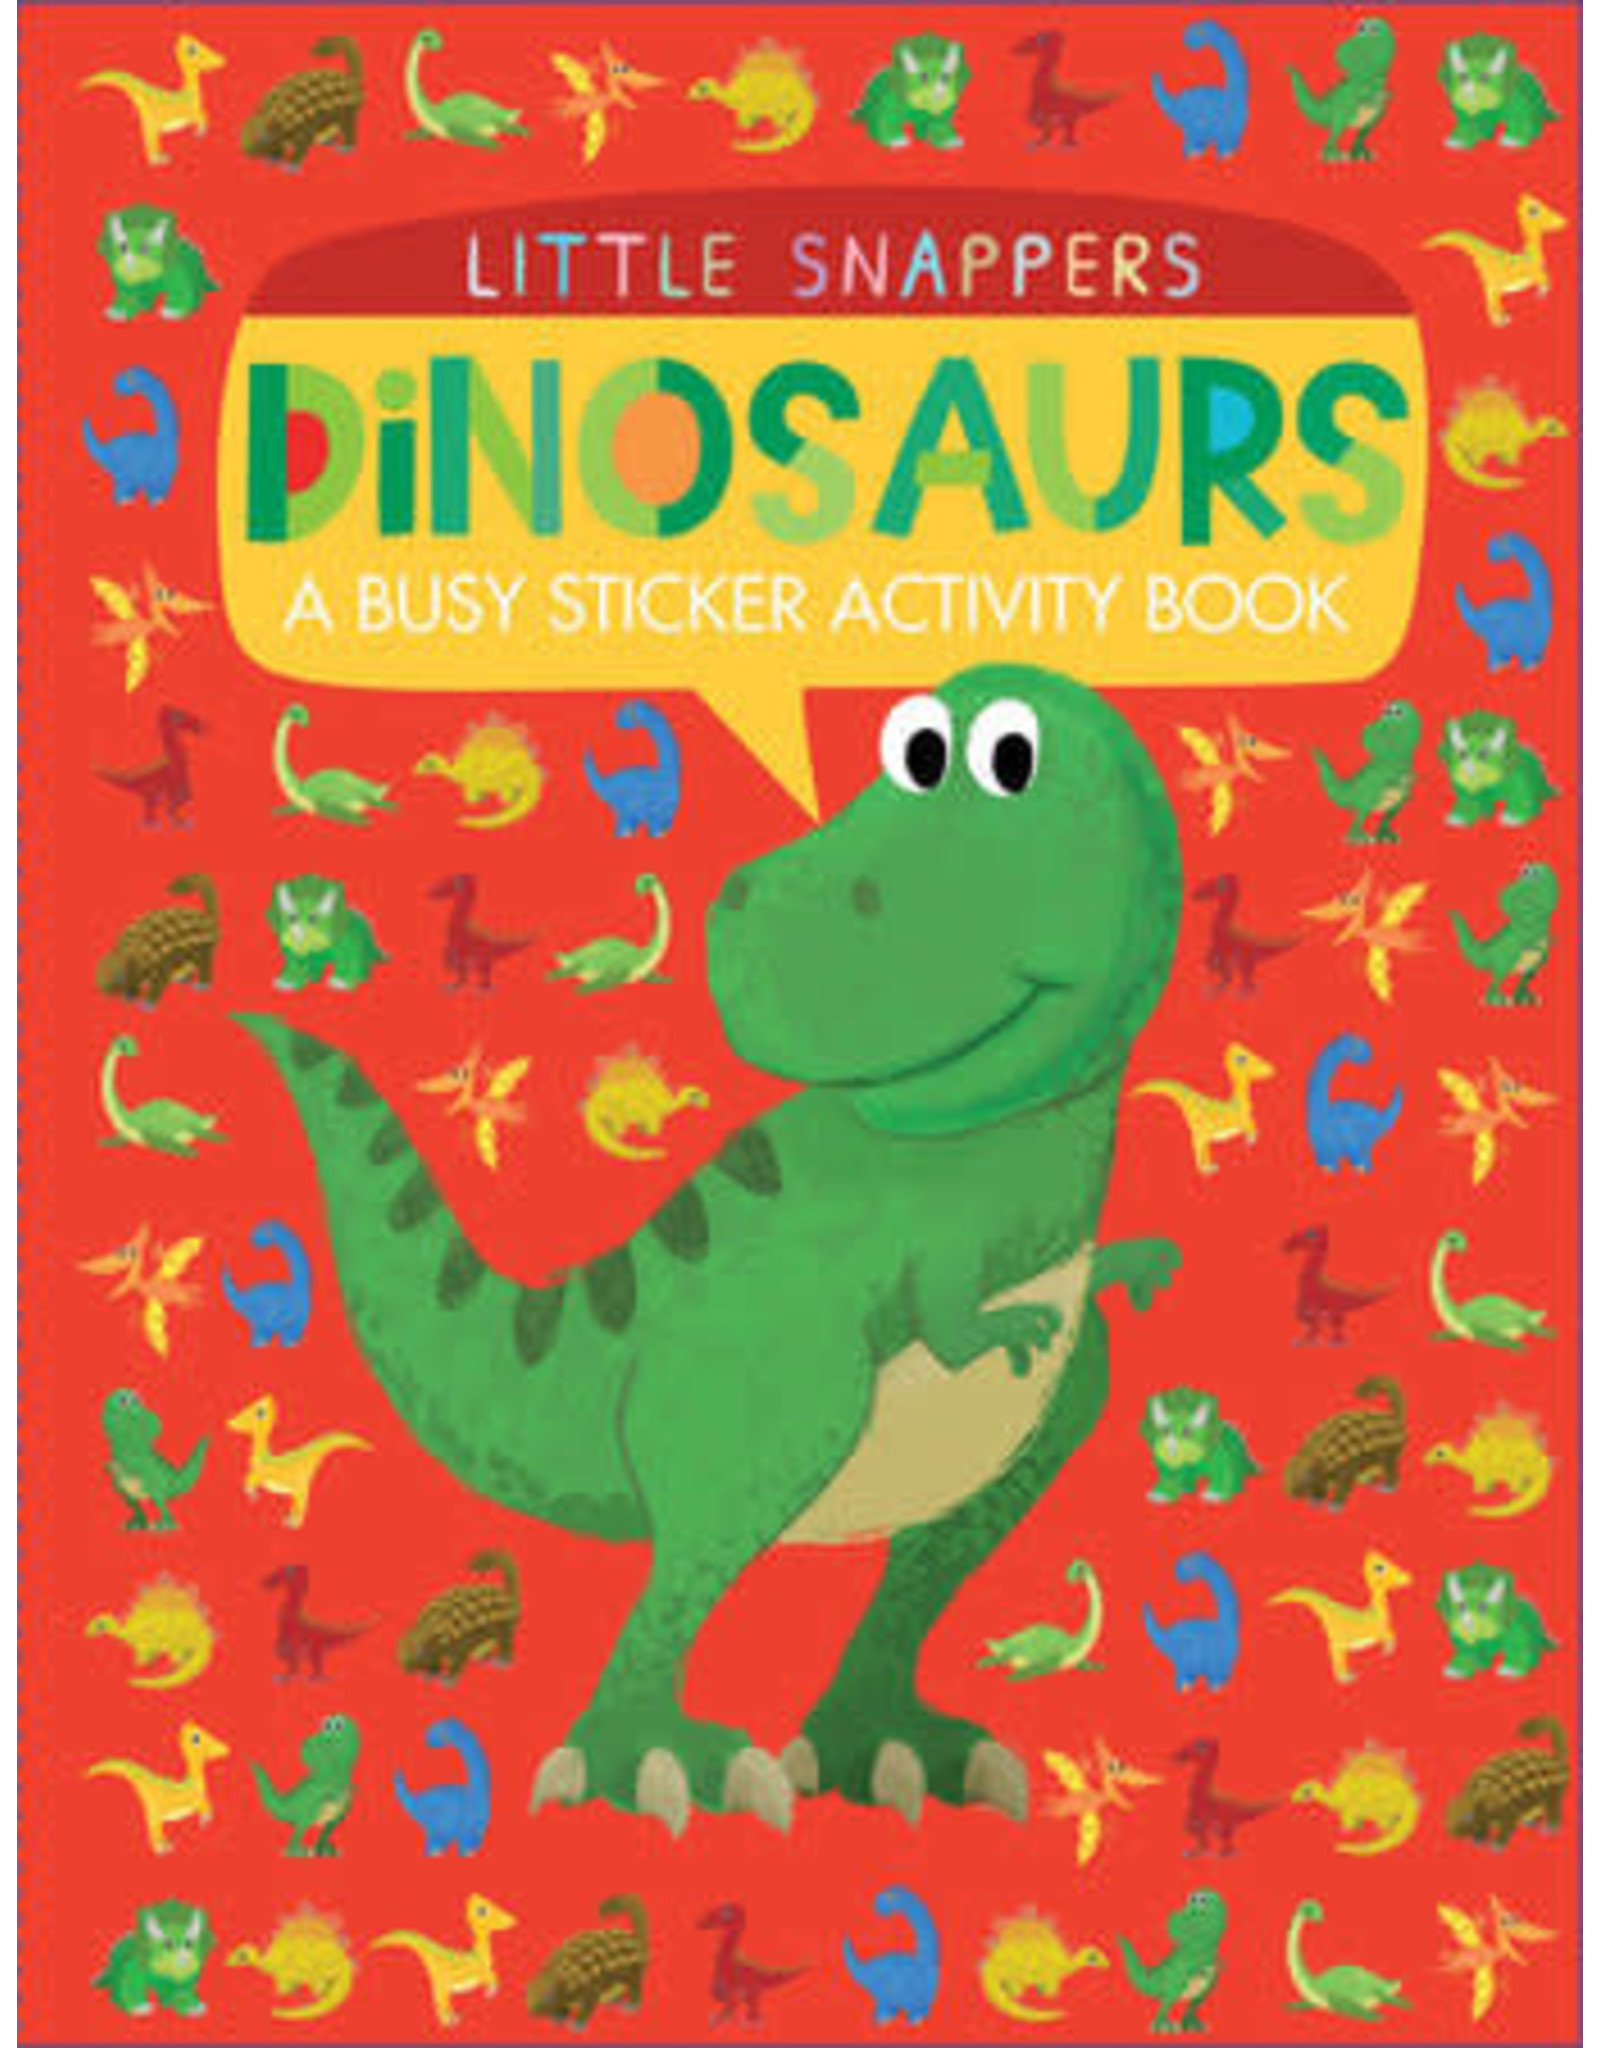 Tiger Tales Little Snapper's Dinosaurs Sticker Activity Book